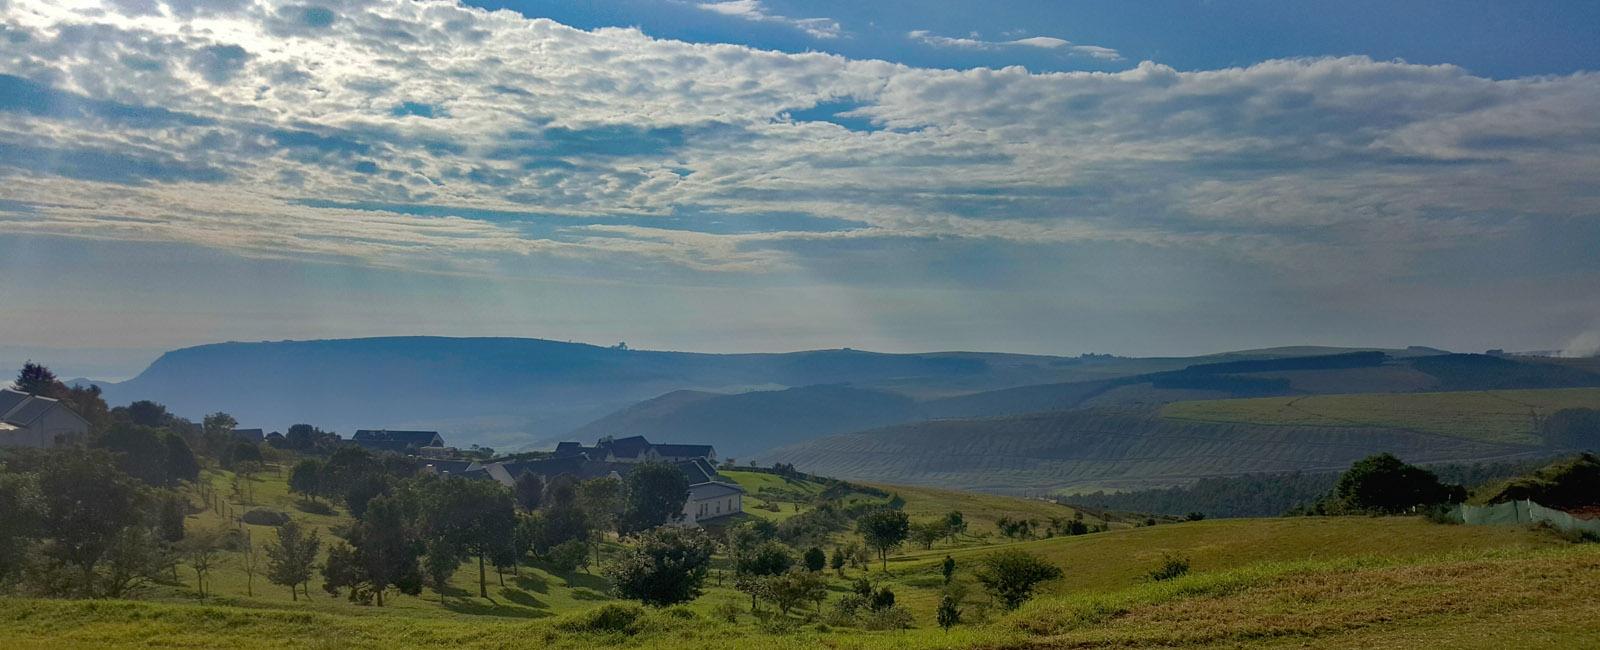 sweeping-views-water-dam-beautiful-views-mountains-classy-stylish-premium-tennis-golf-garlington-estate-kzn-midlands-housing-countryside-country-farm-secure-hills